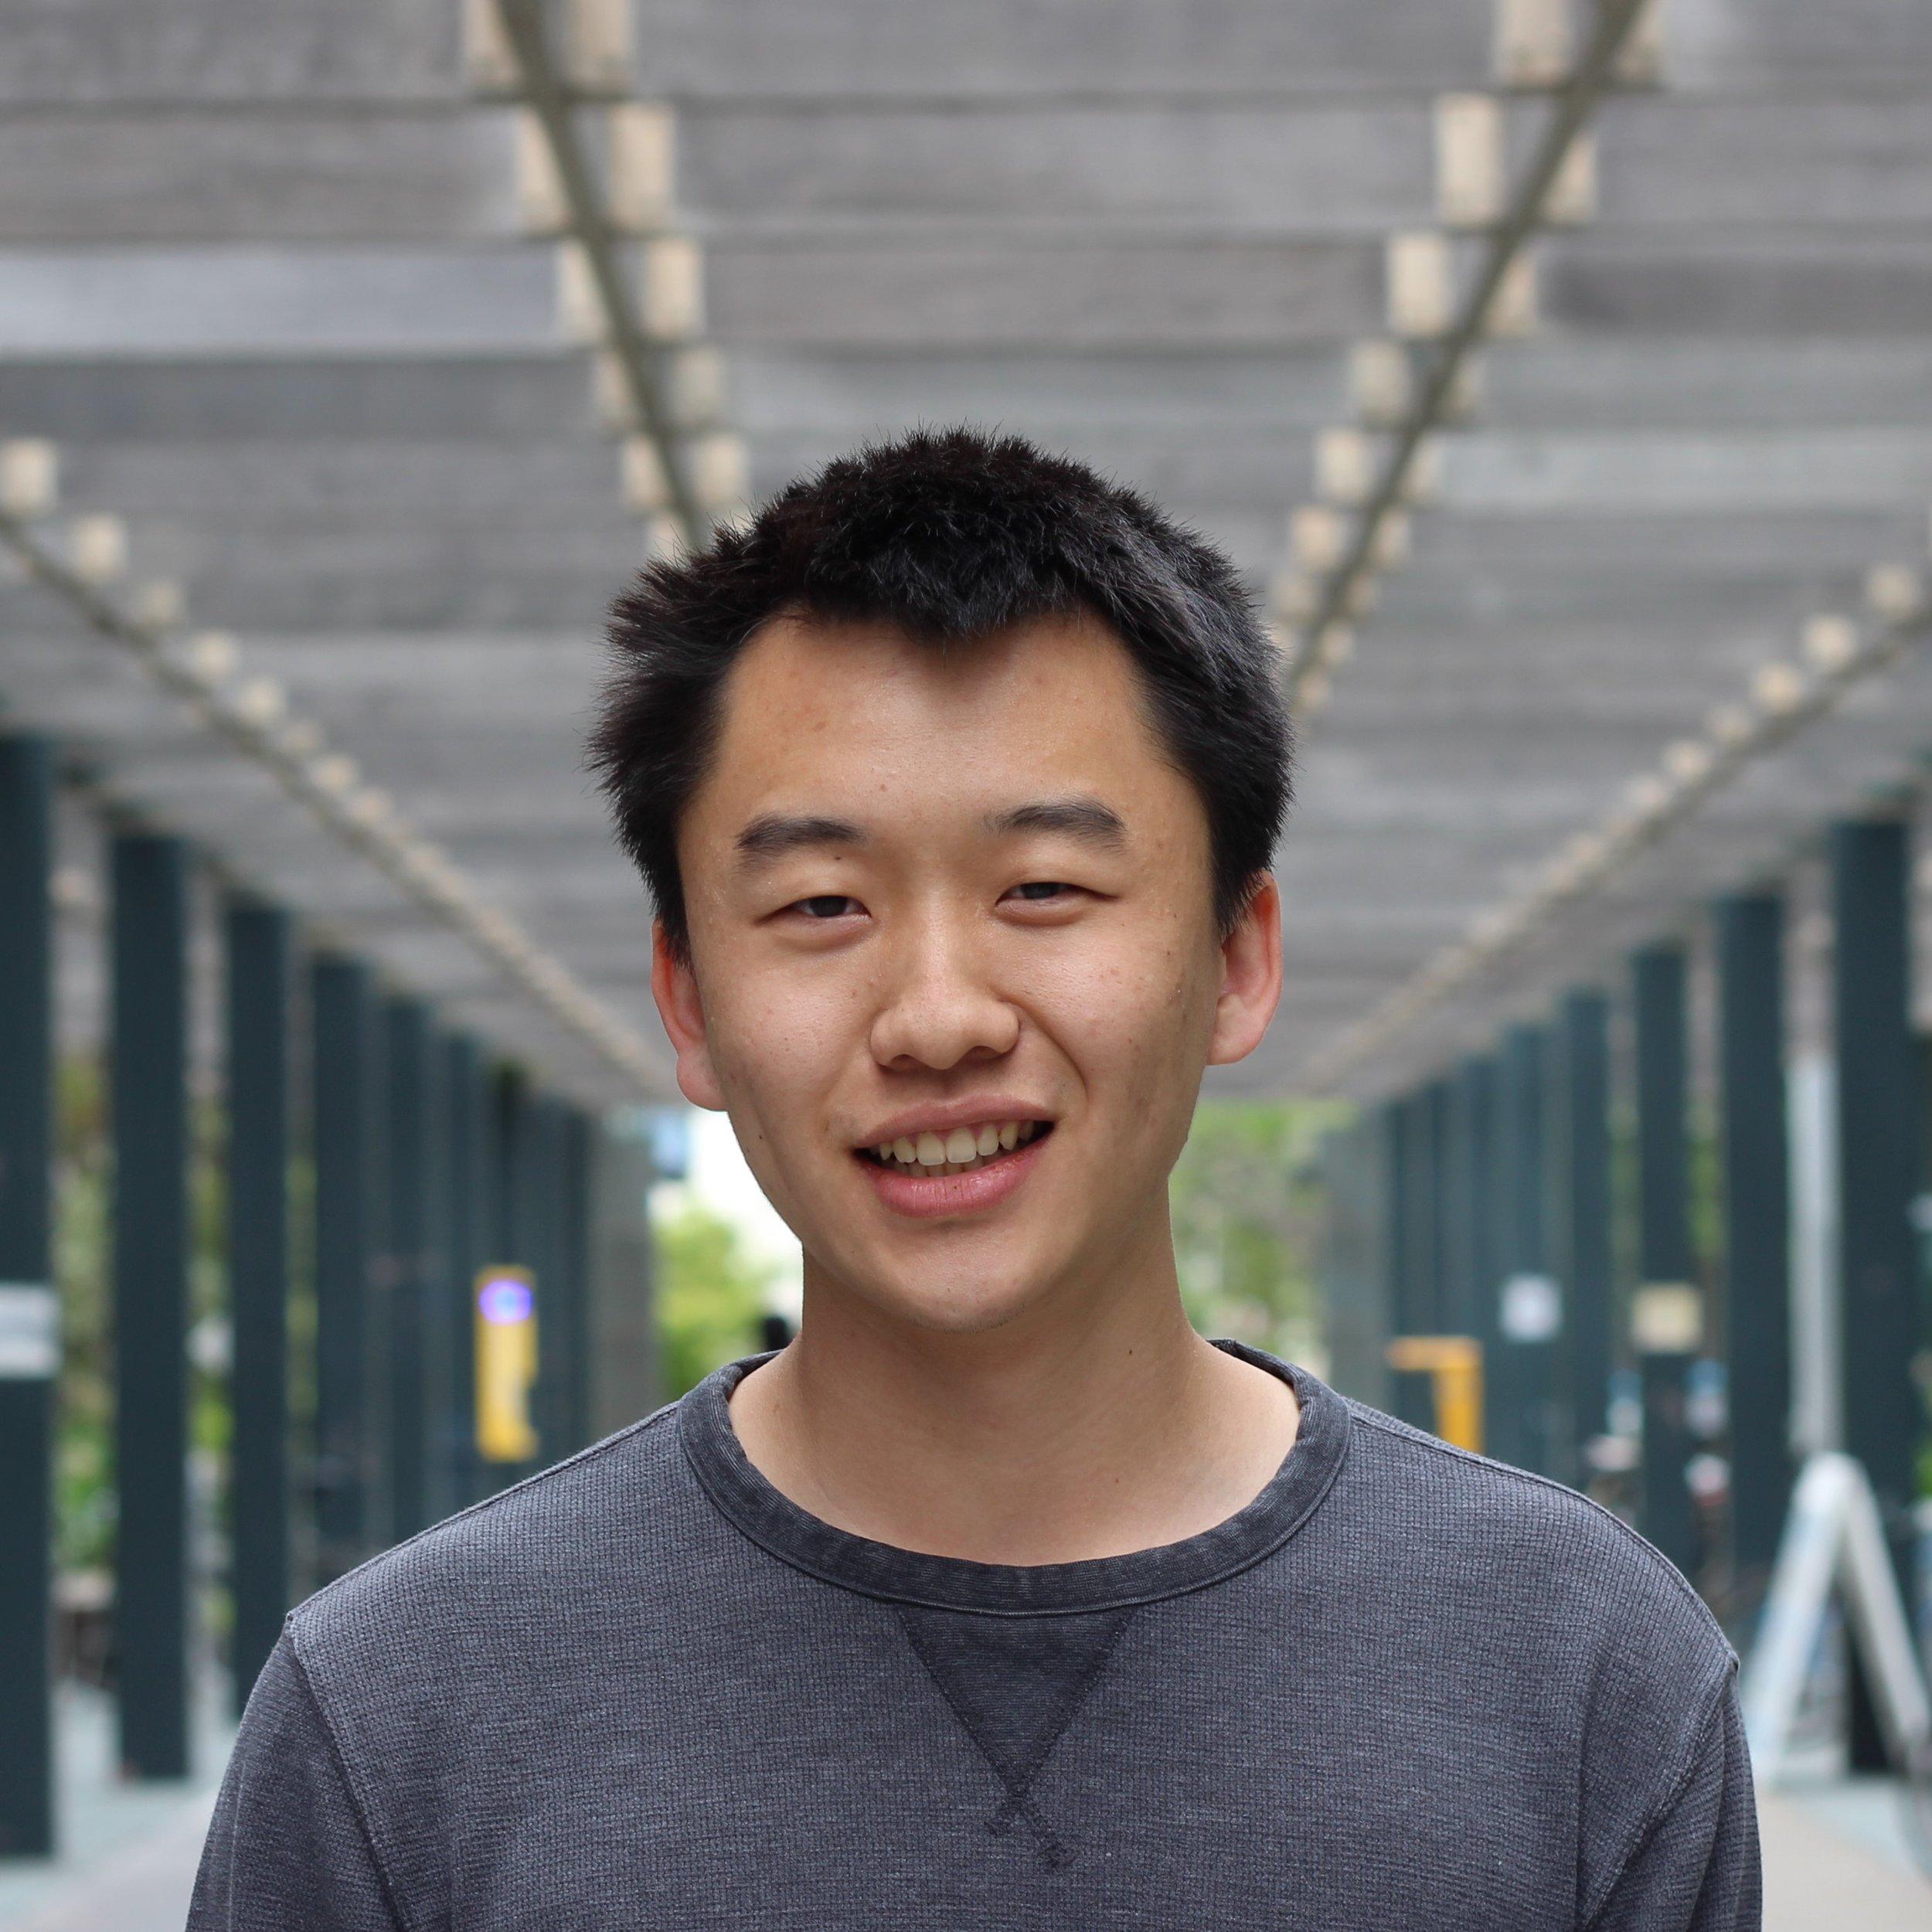 Peter Zhu by Pi Tau Sigma